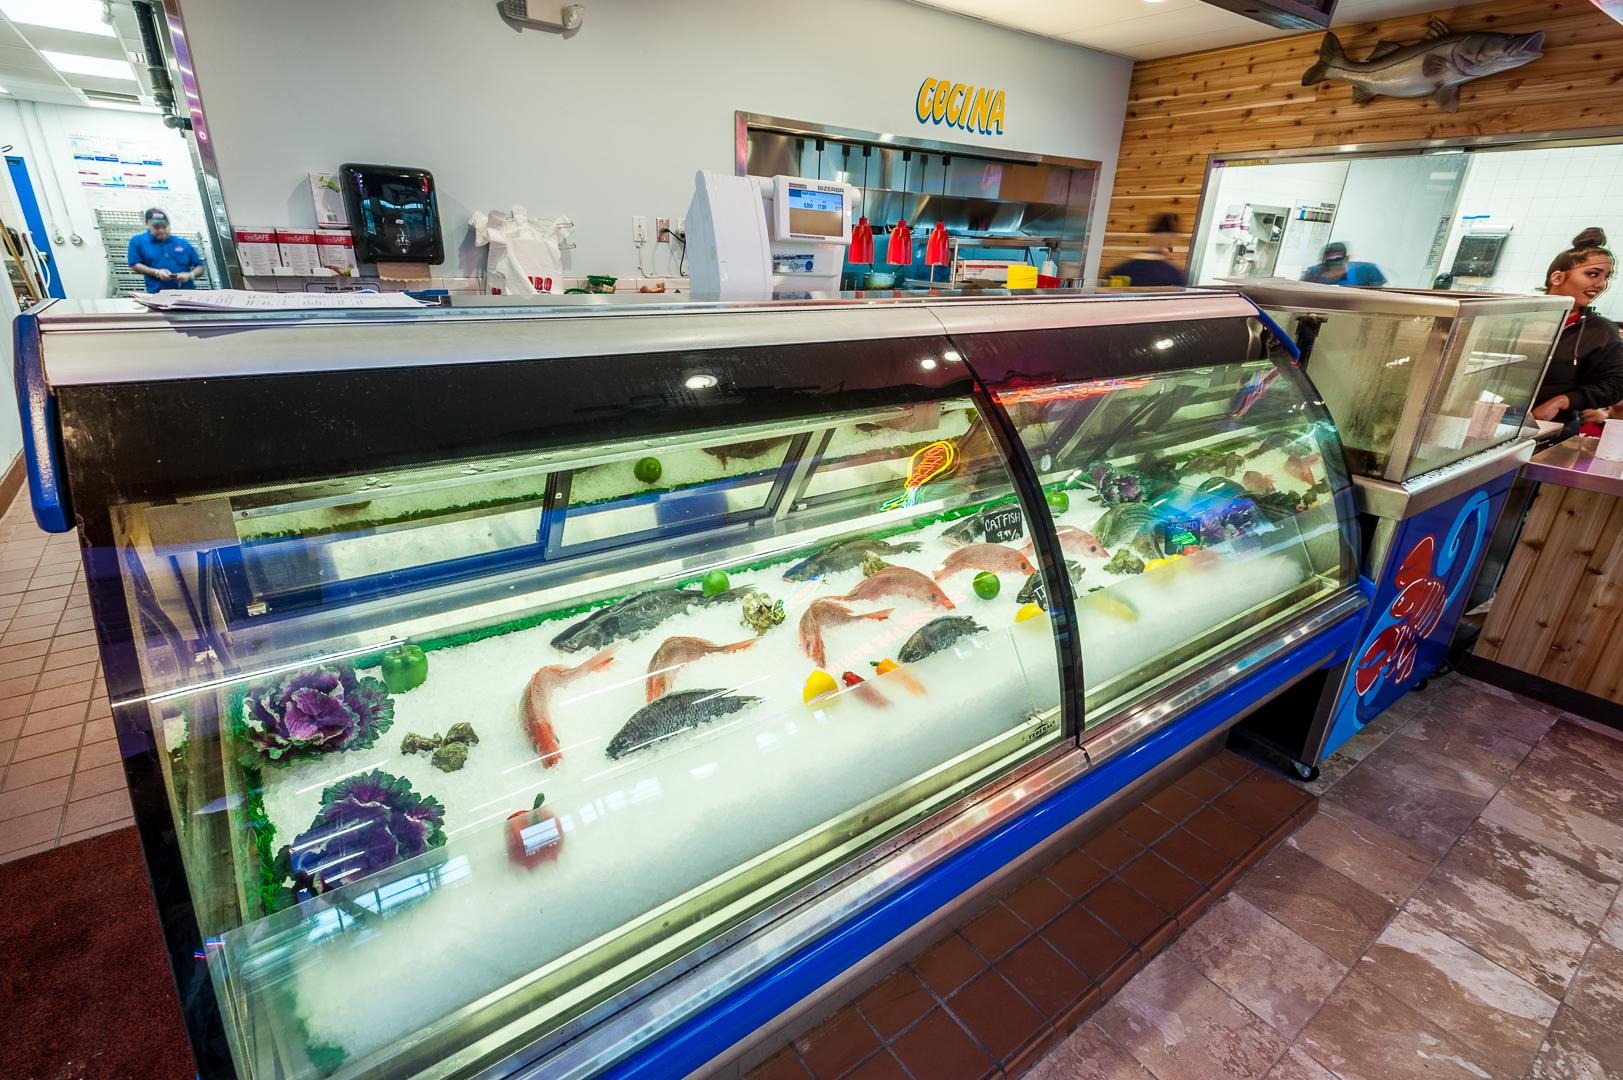 Mambo Seafood - Baytown TX - Mike Martin-11.jpg